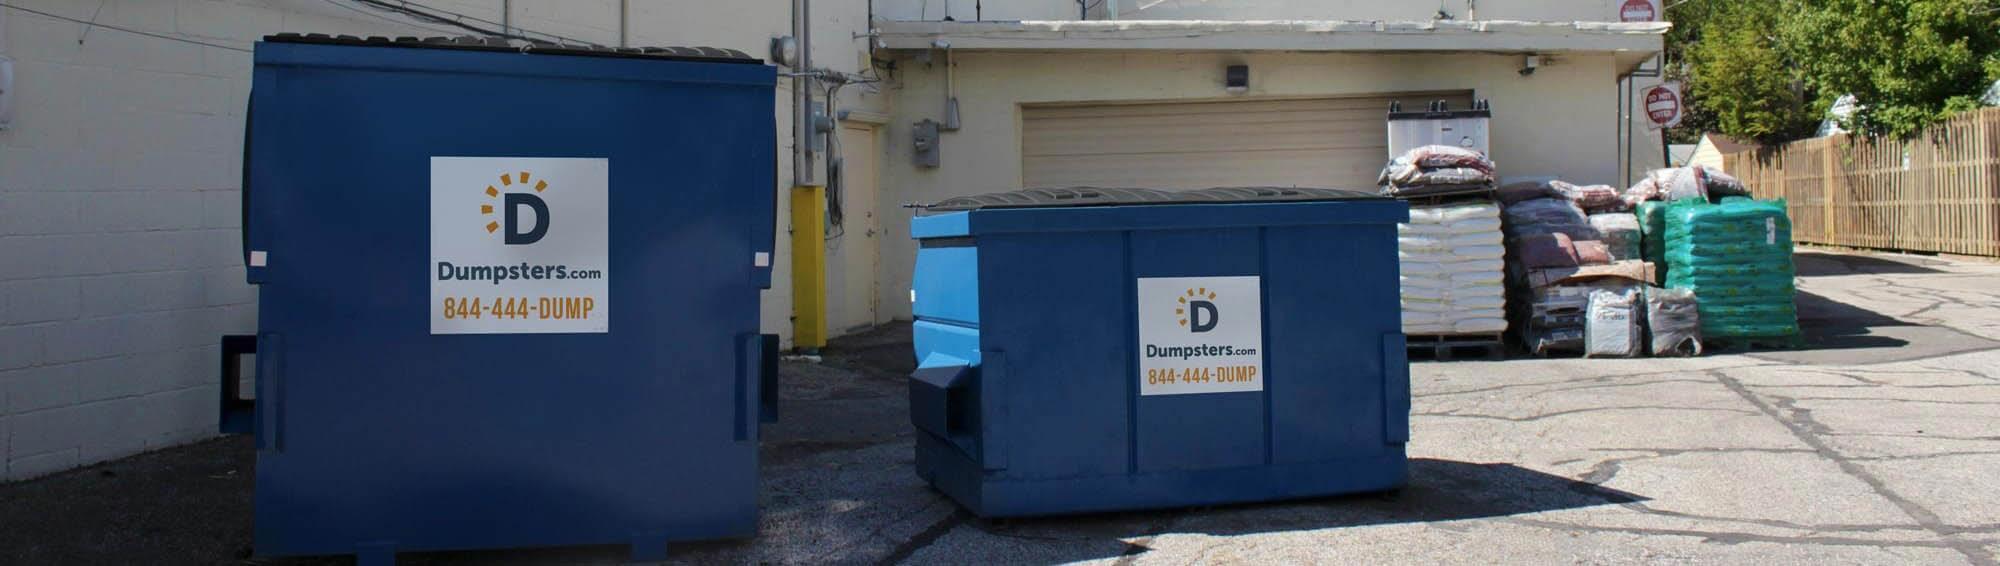 commercial dumpster sizes